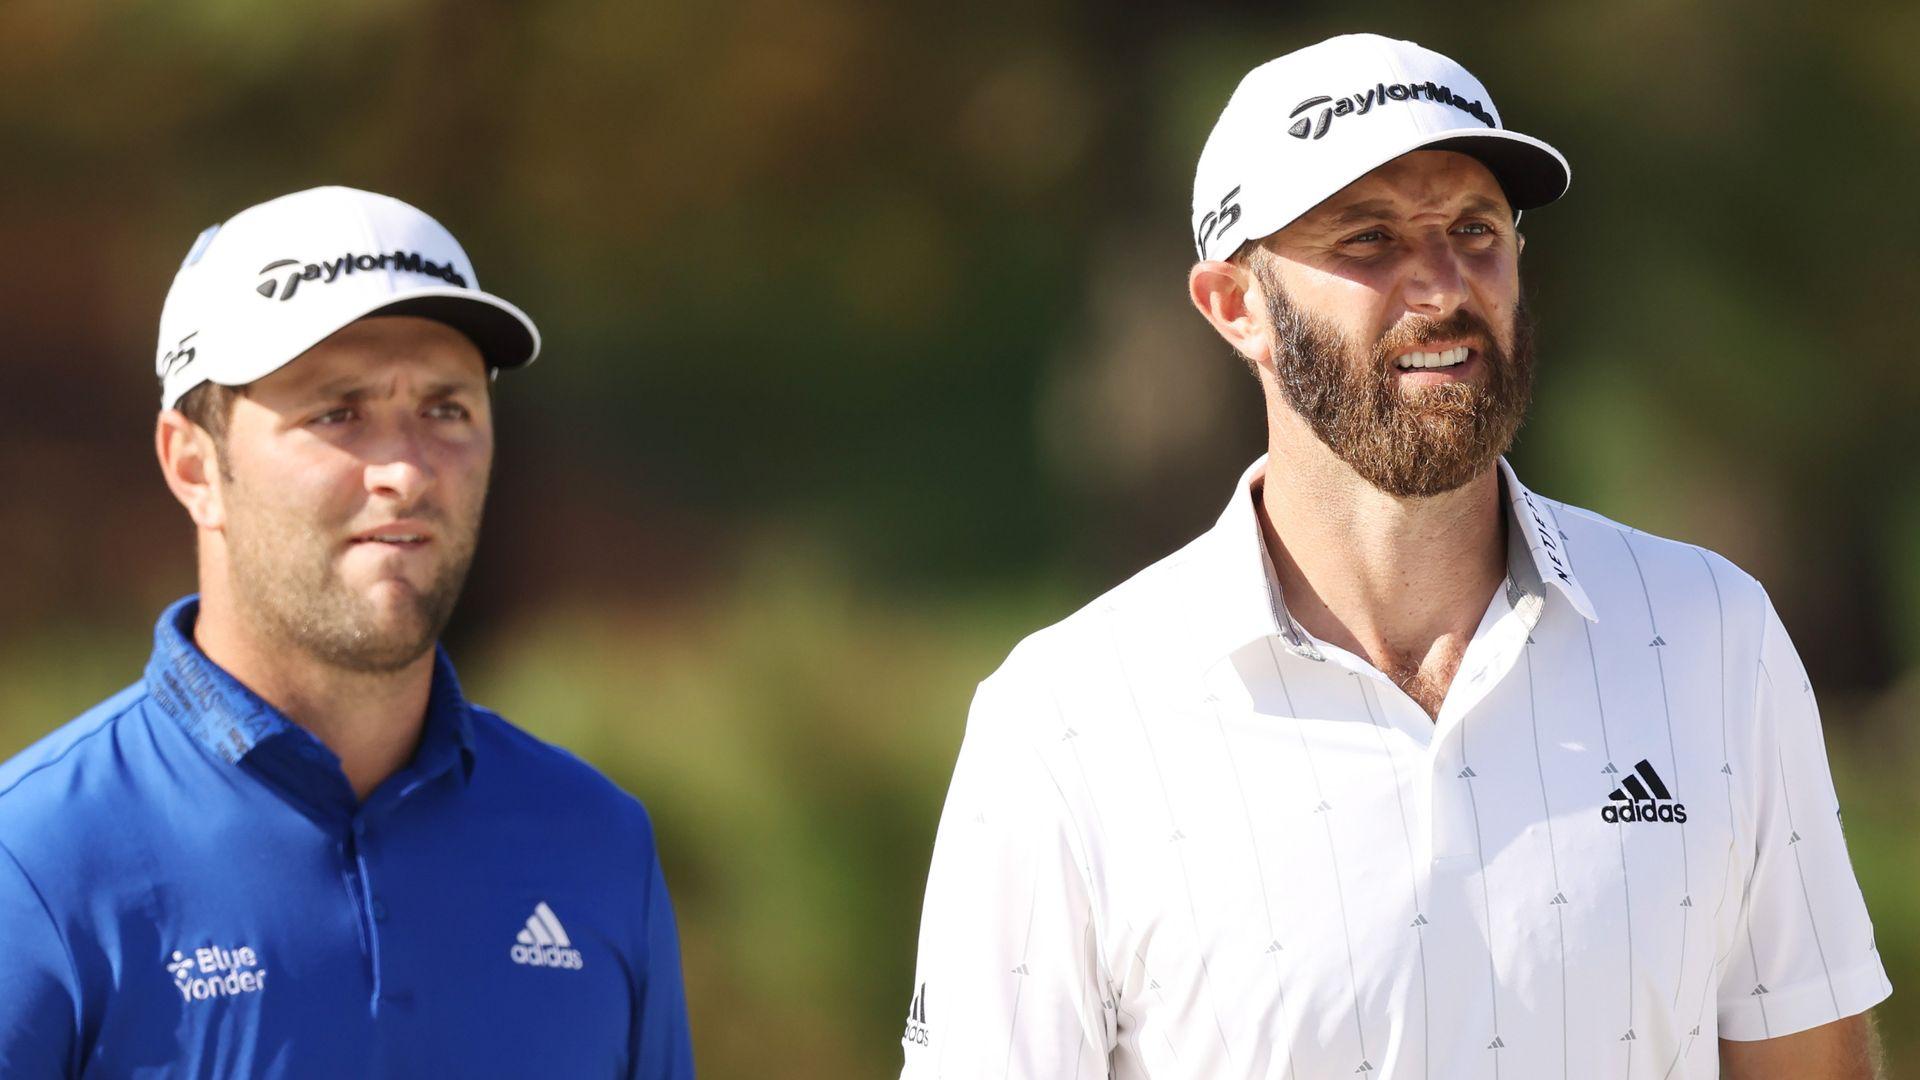 Paul McGinley: PGA Tour's alliance with European Tour is good for golf